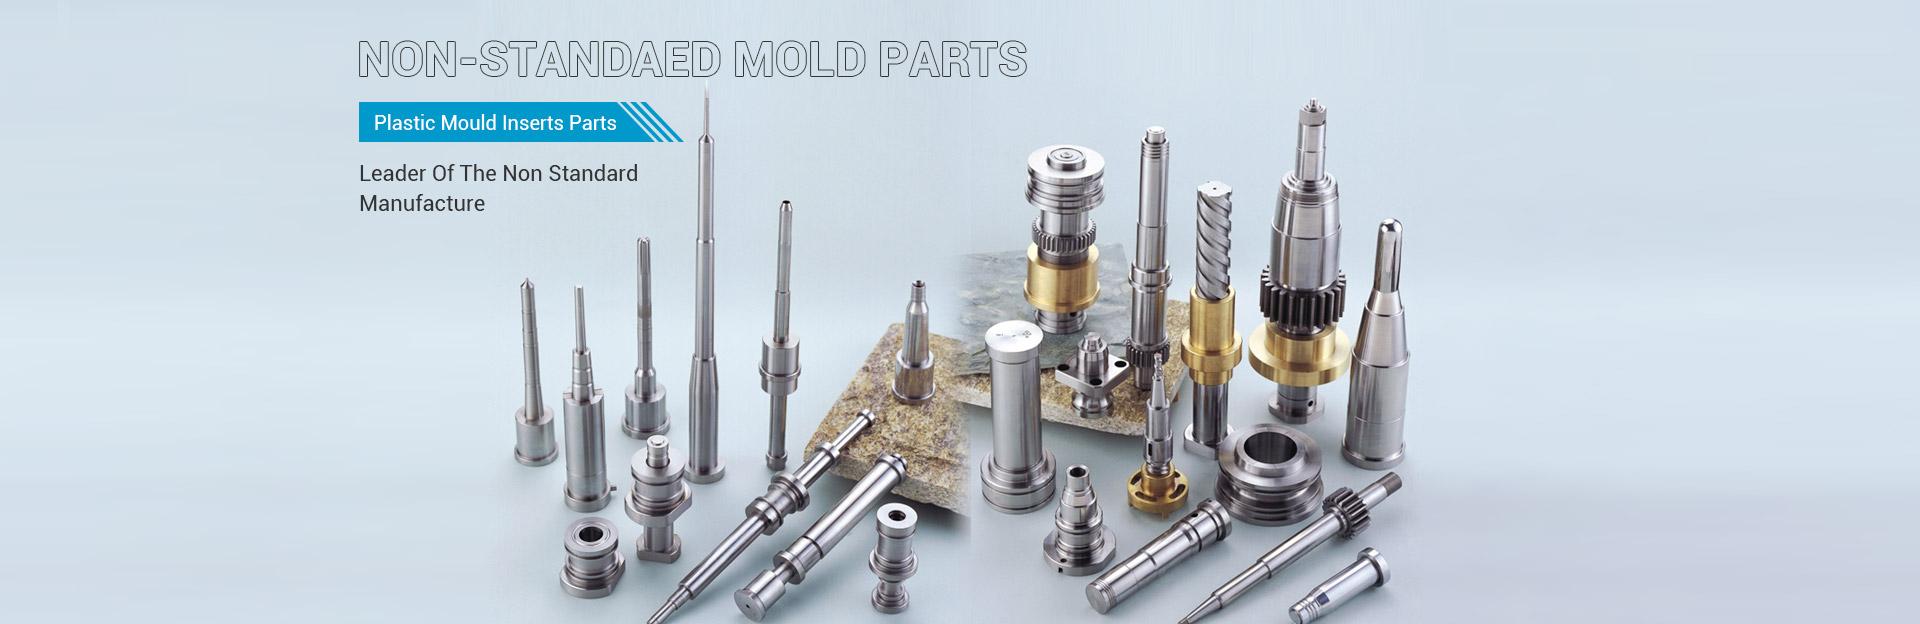 Non-Standard Mold Parts